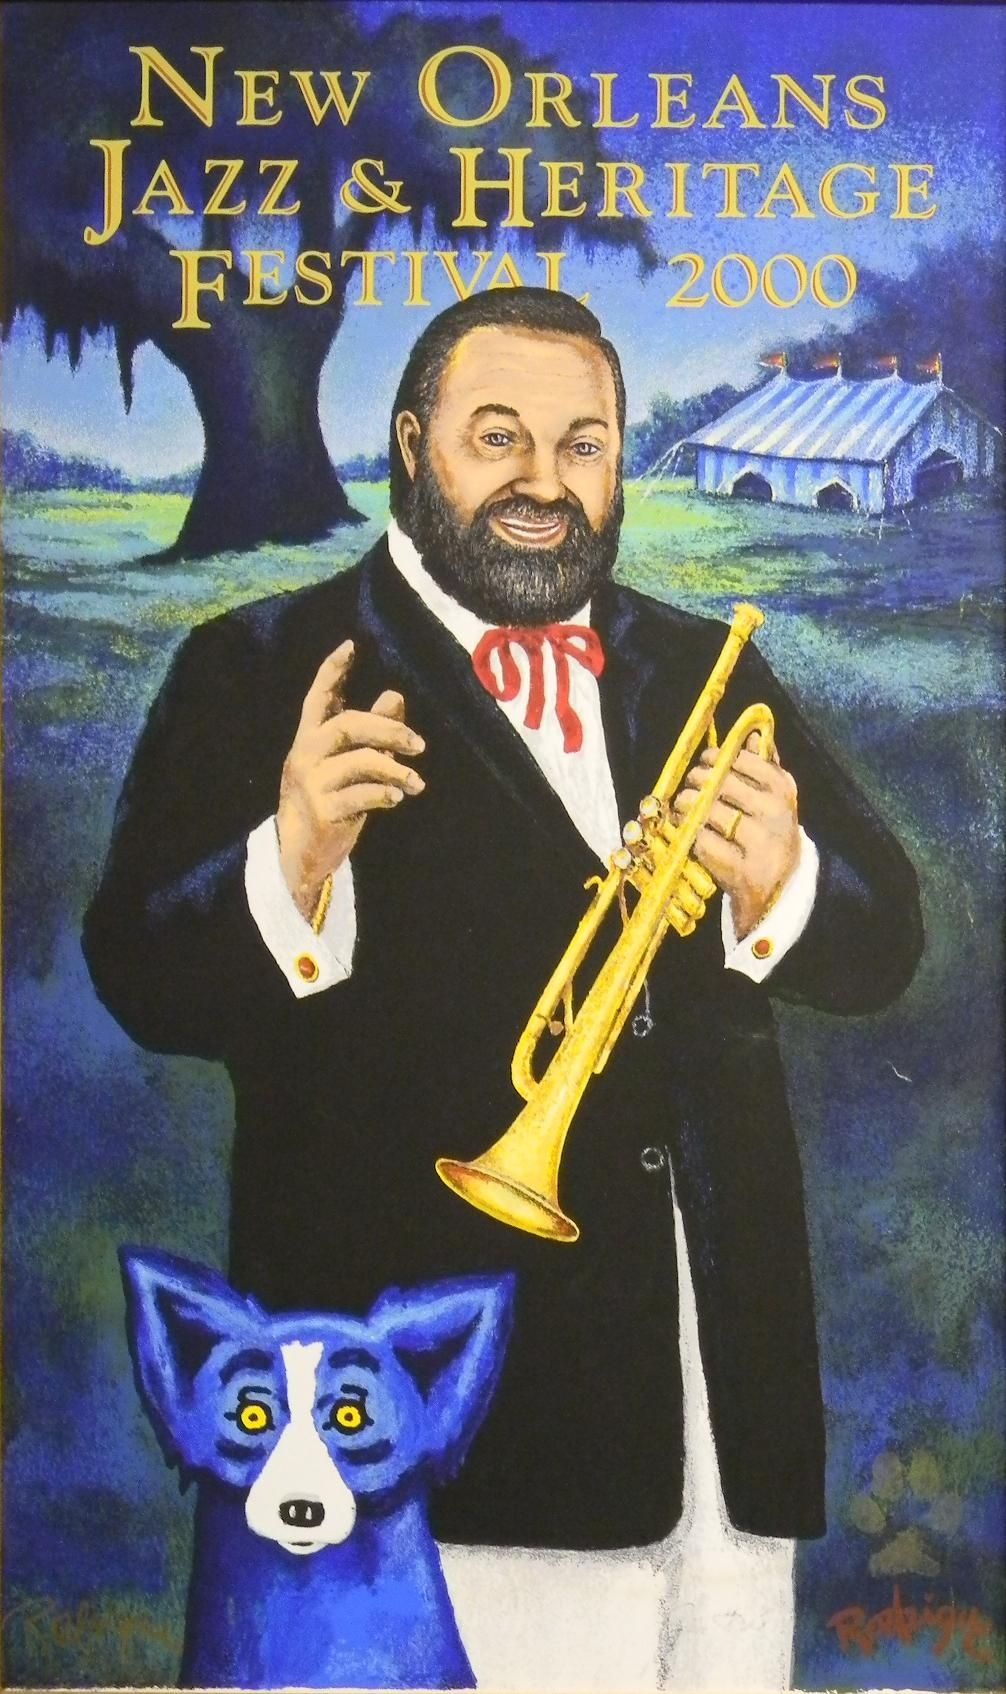 www.art4now.com - in Vintage Jazz Fest 2000 New Orleans Jazz & Heritage Festival poster